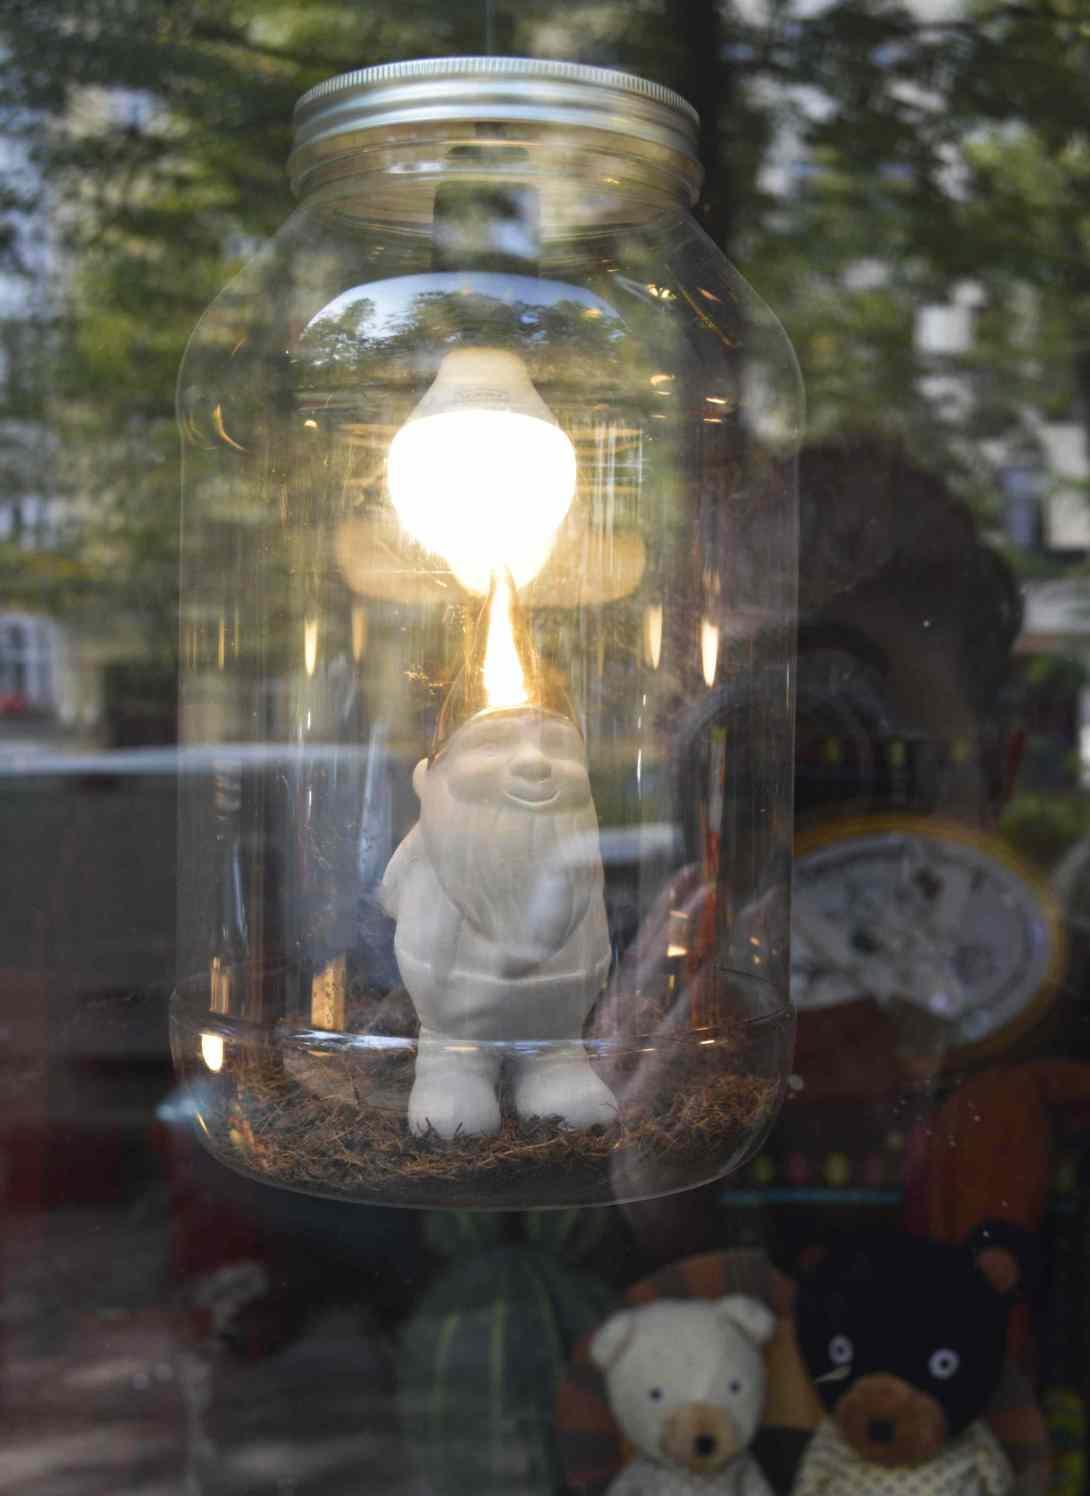 self portrait with garden gnome lamp berlin be kitschig blog